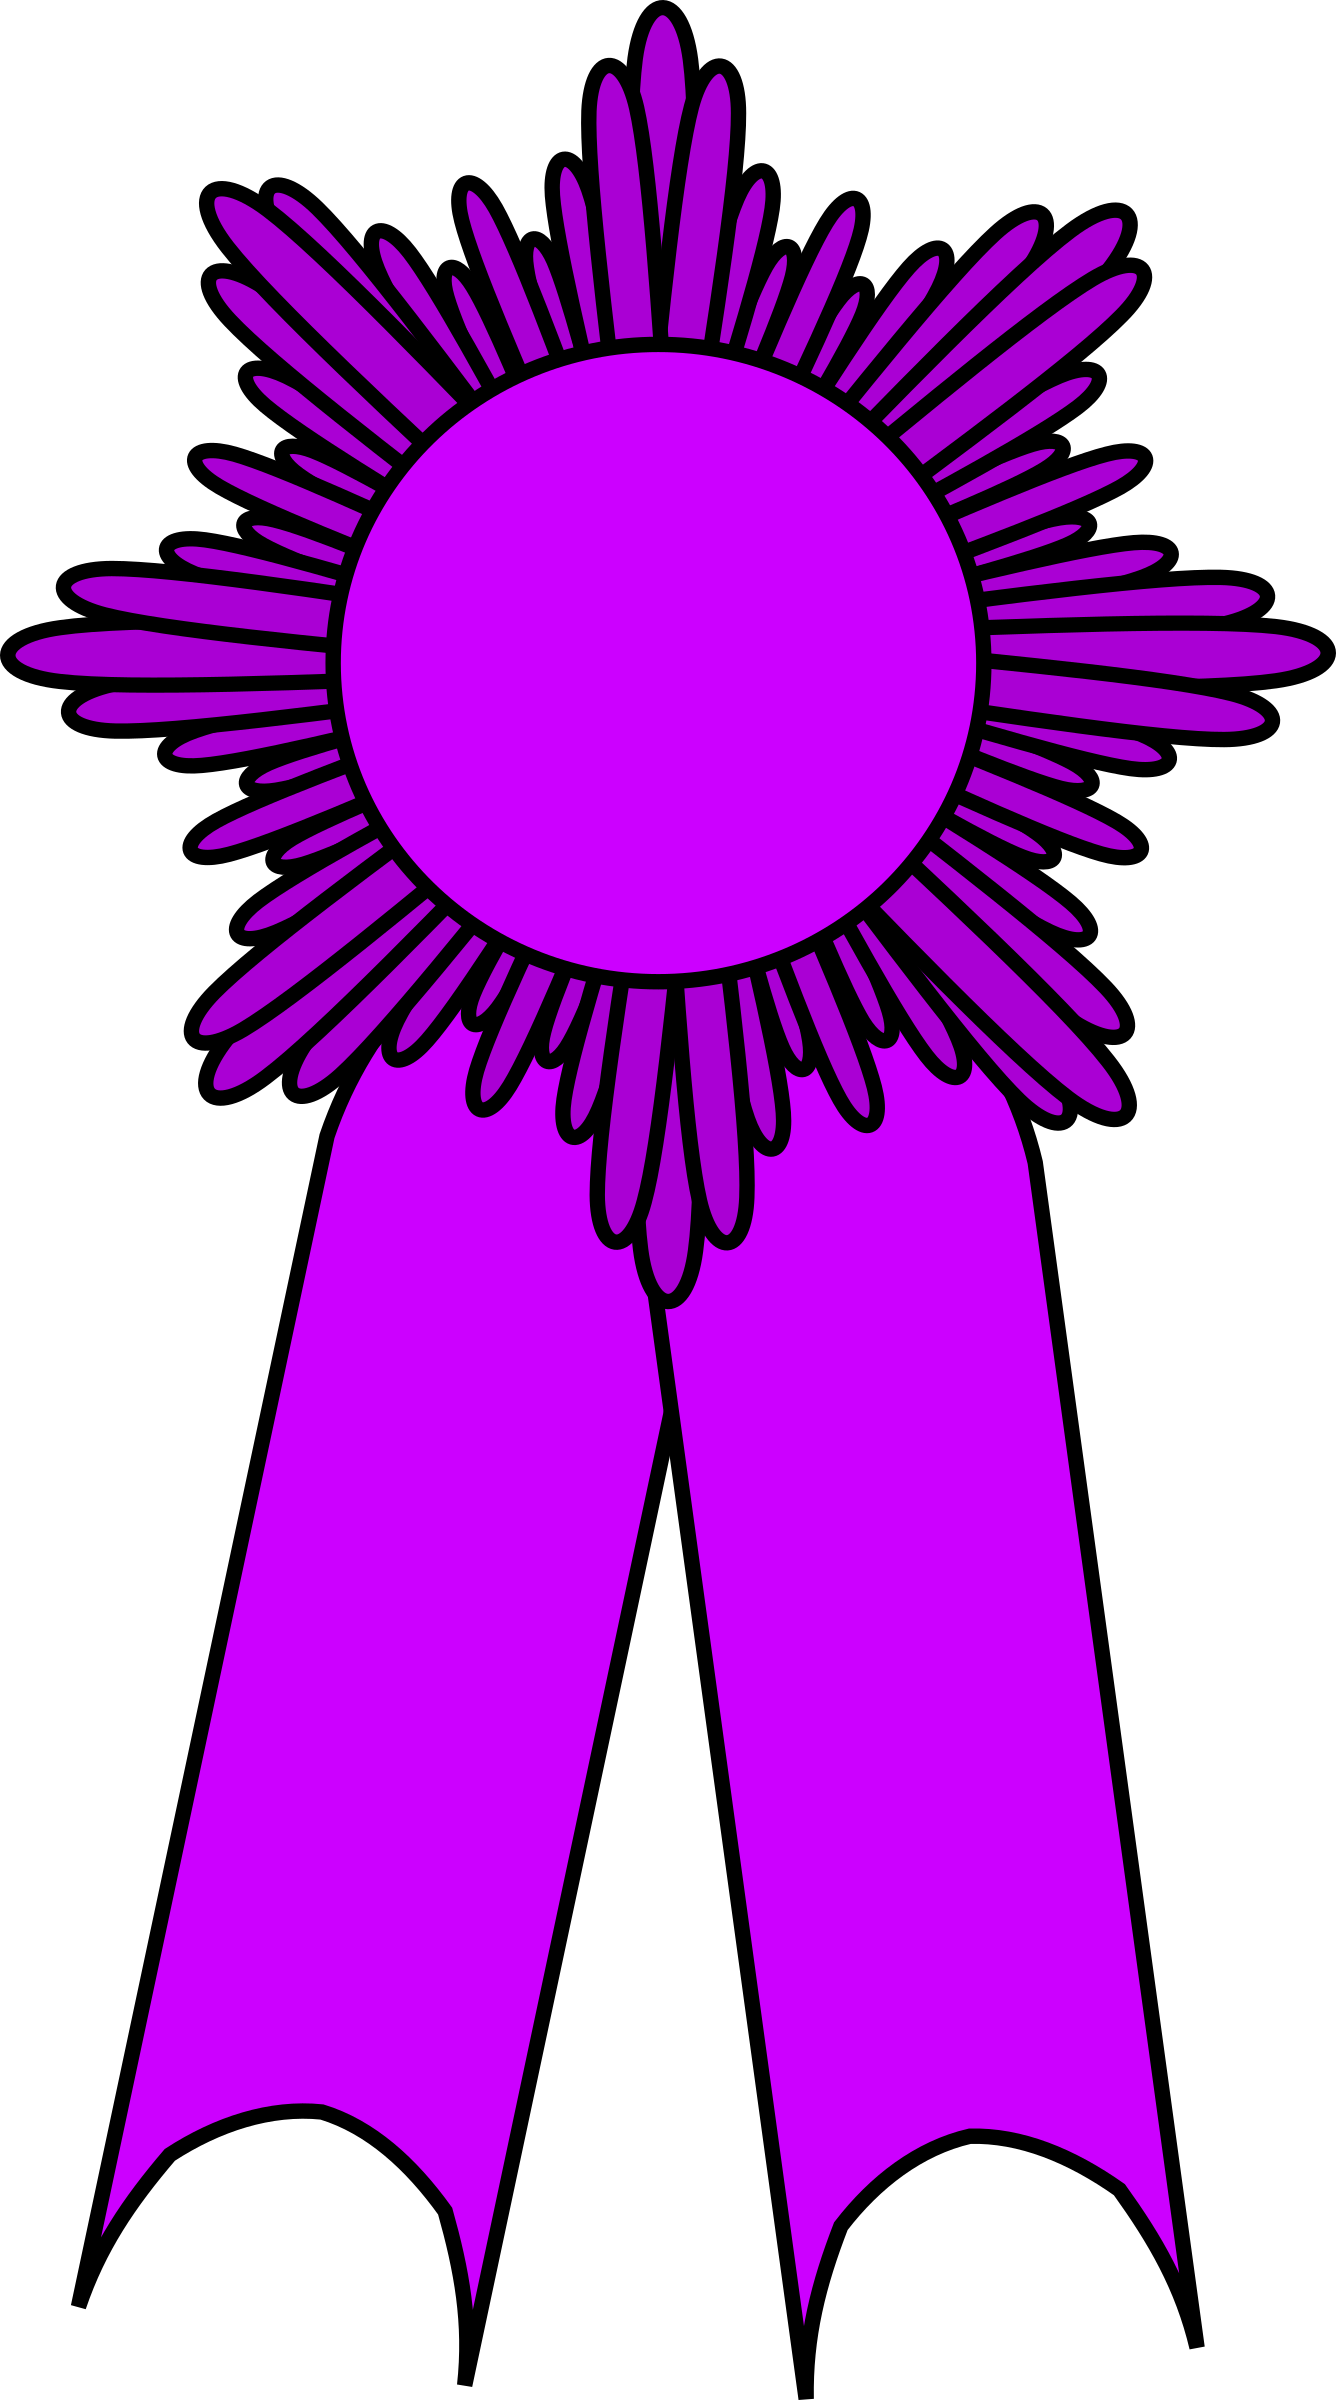 Prize ribbon big image. Purple clipart medal